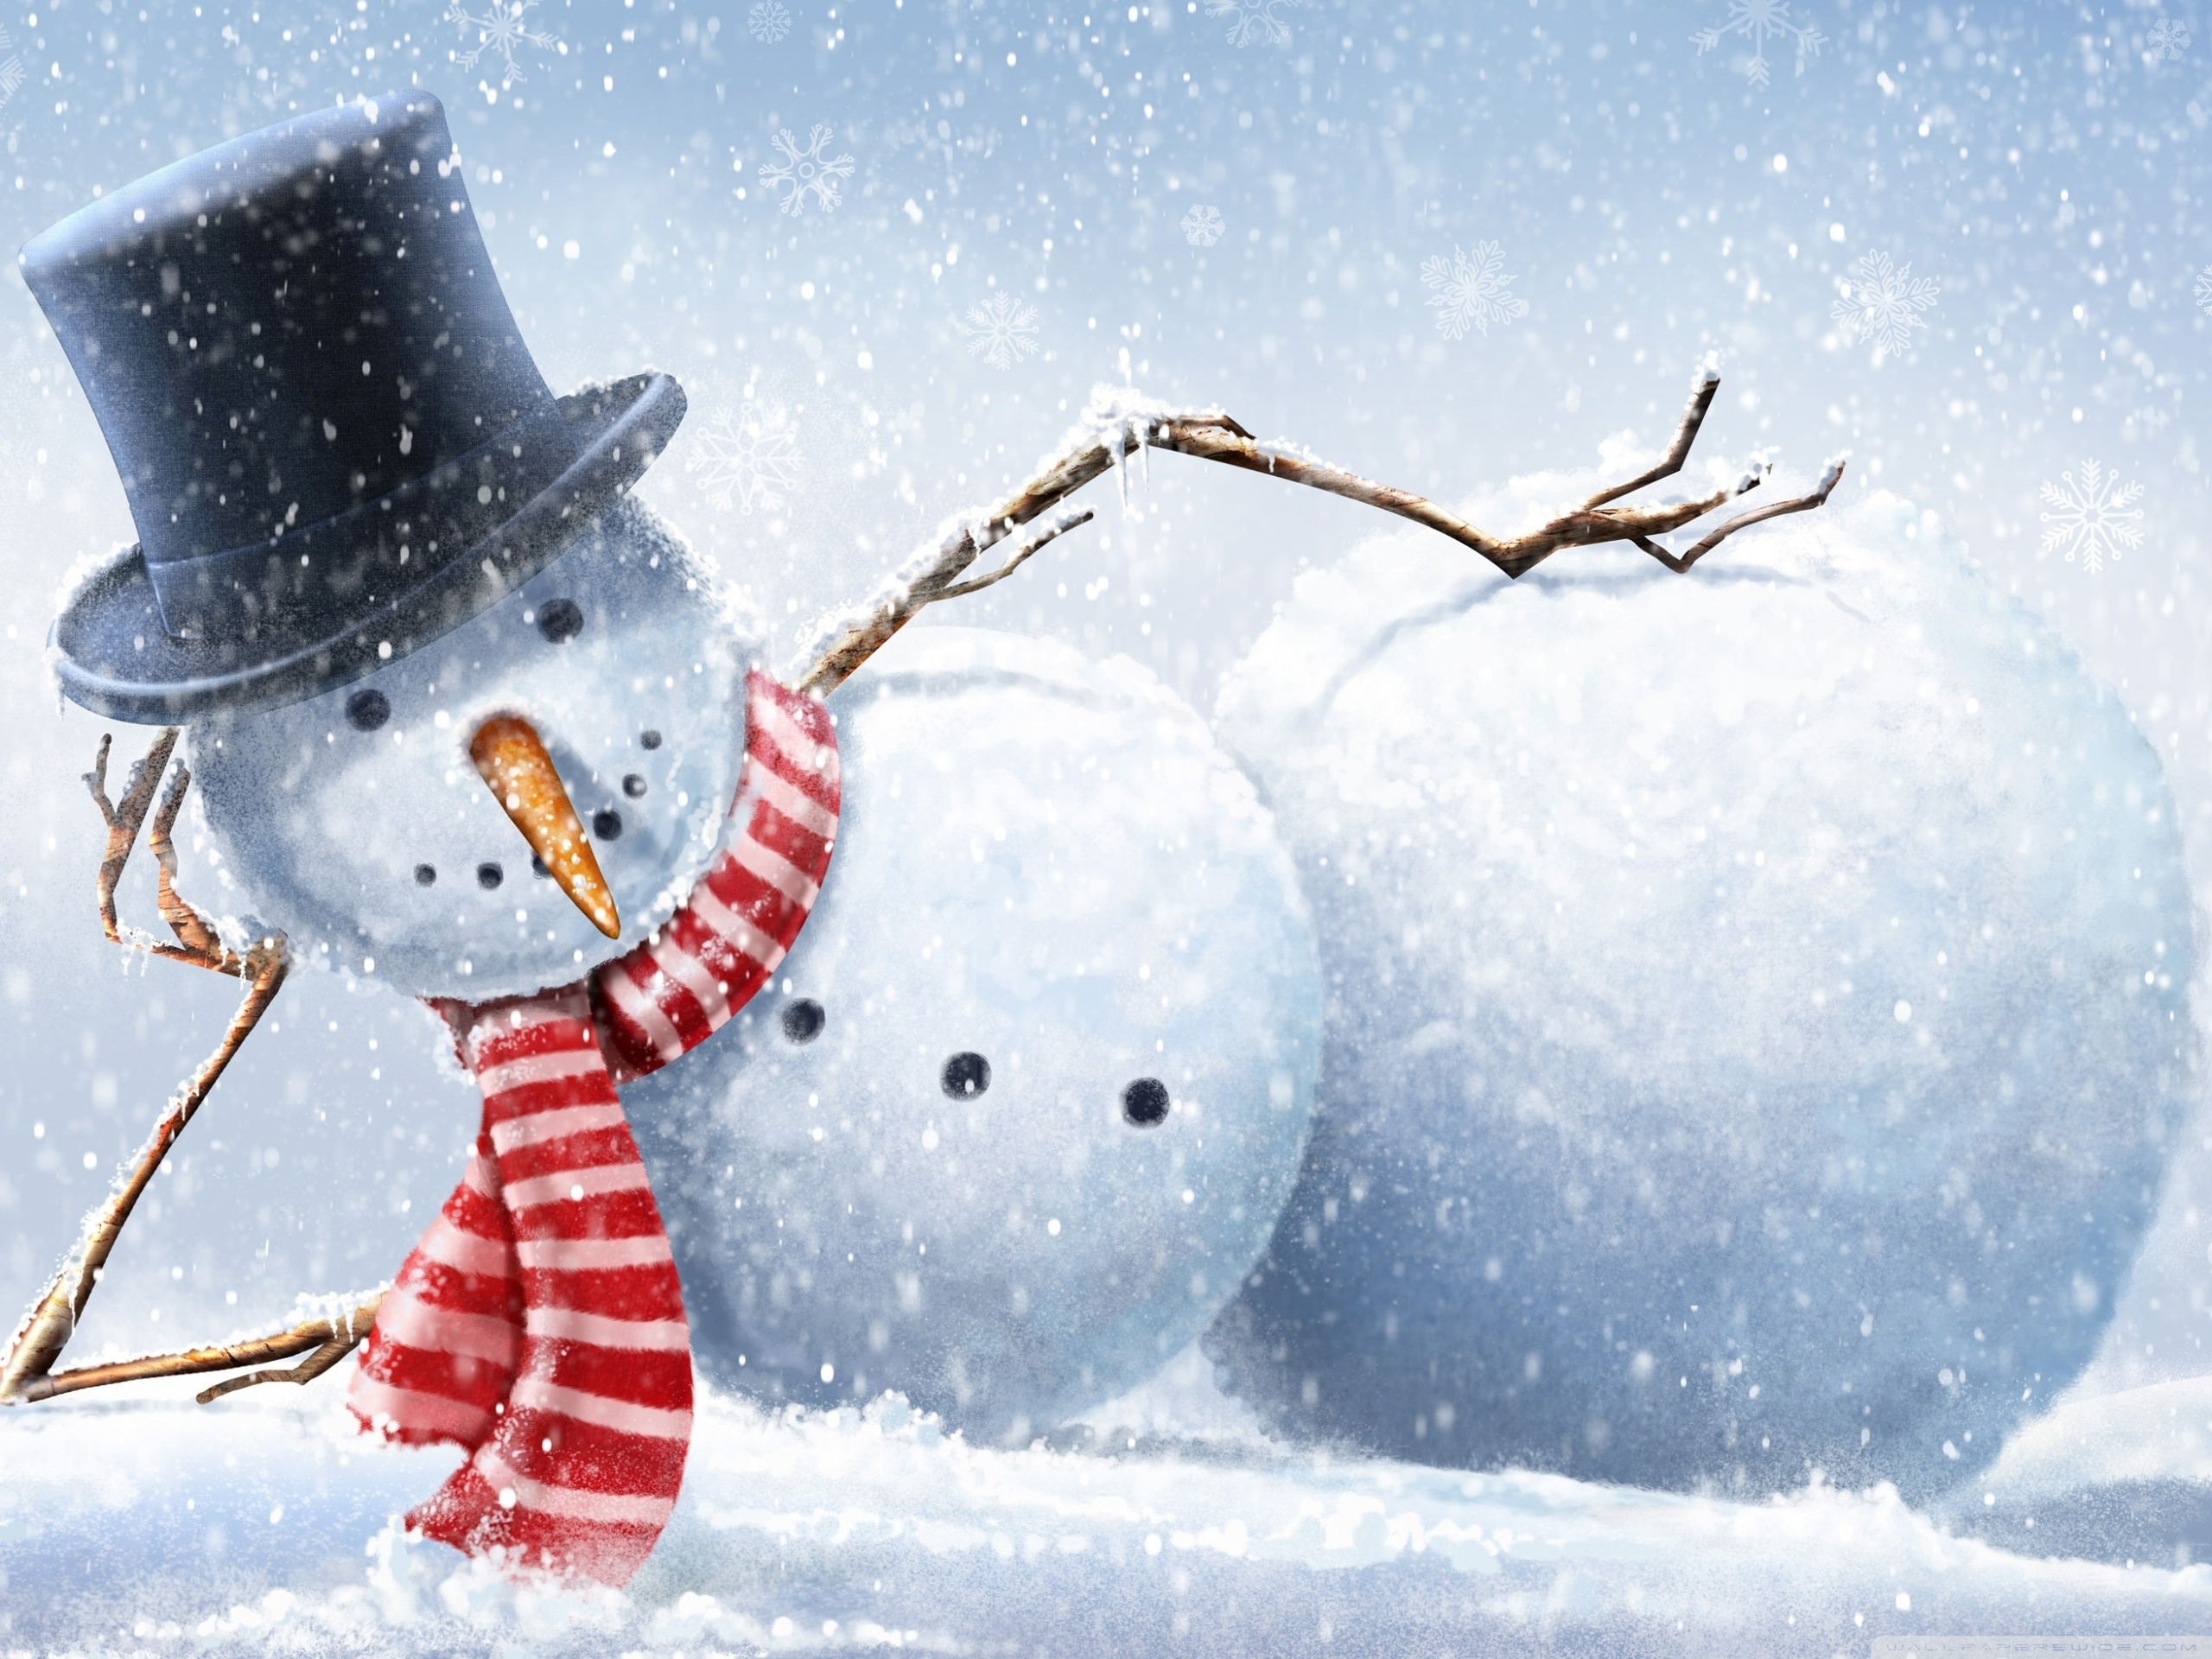 Cool Snowman 4K HD Desktop Wallpaper for 4K Ultra HD TV 2560x1920